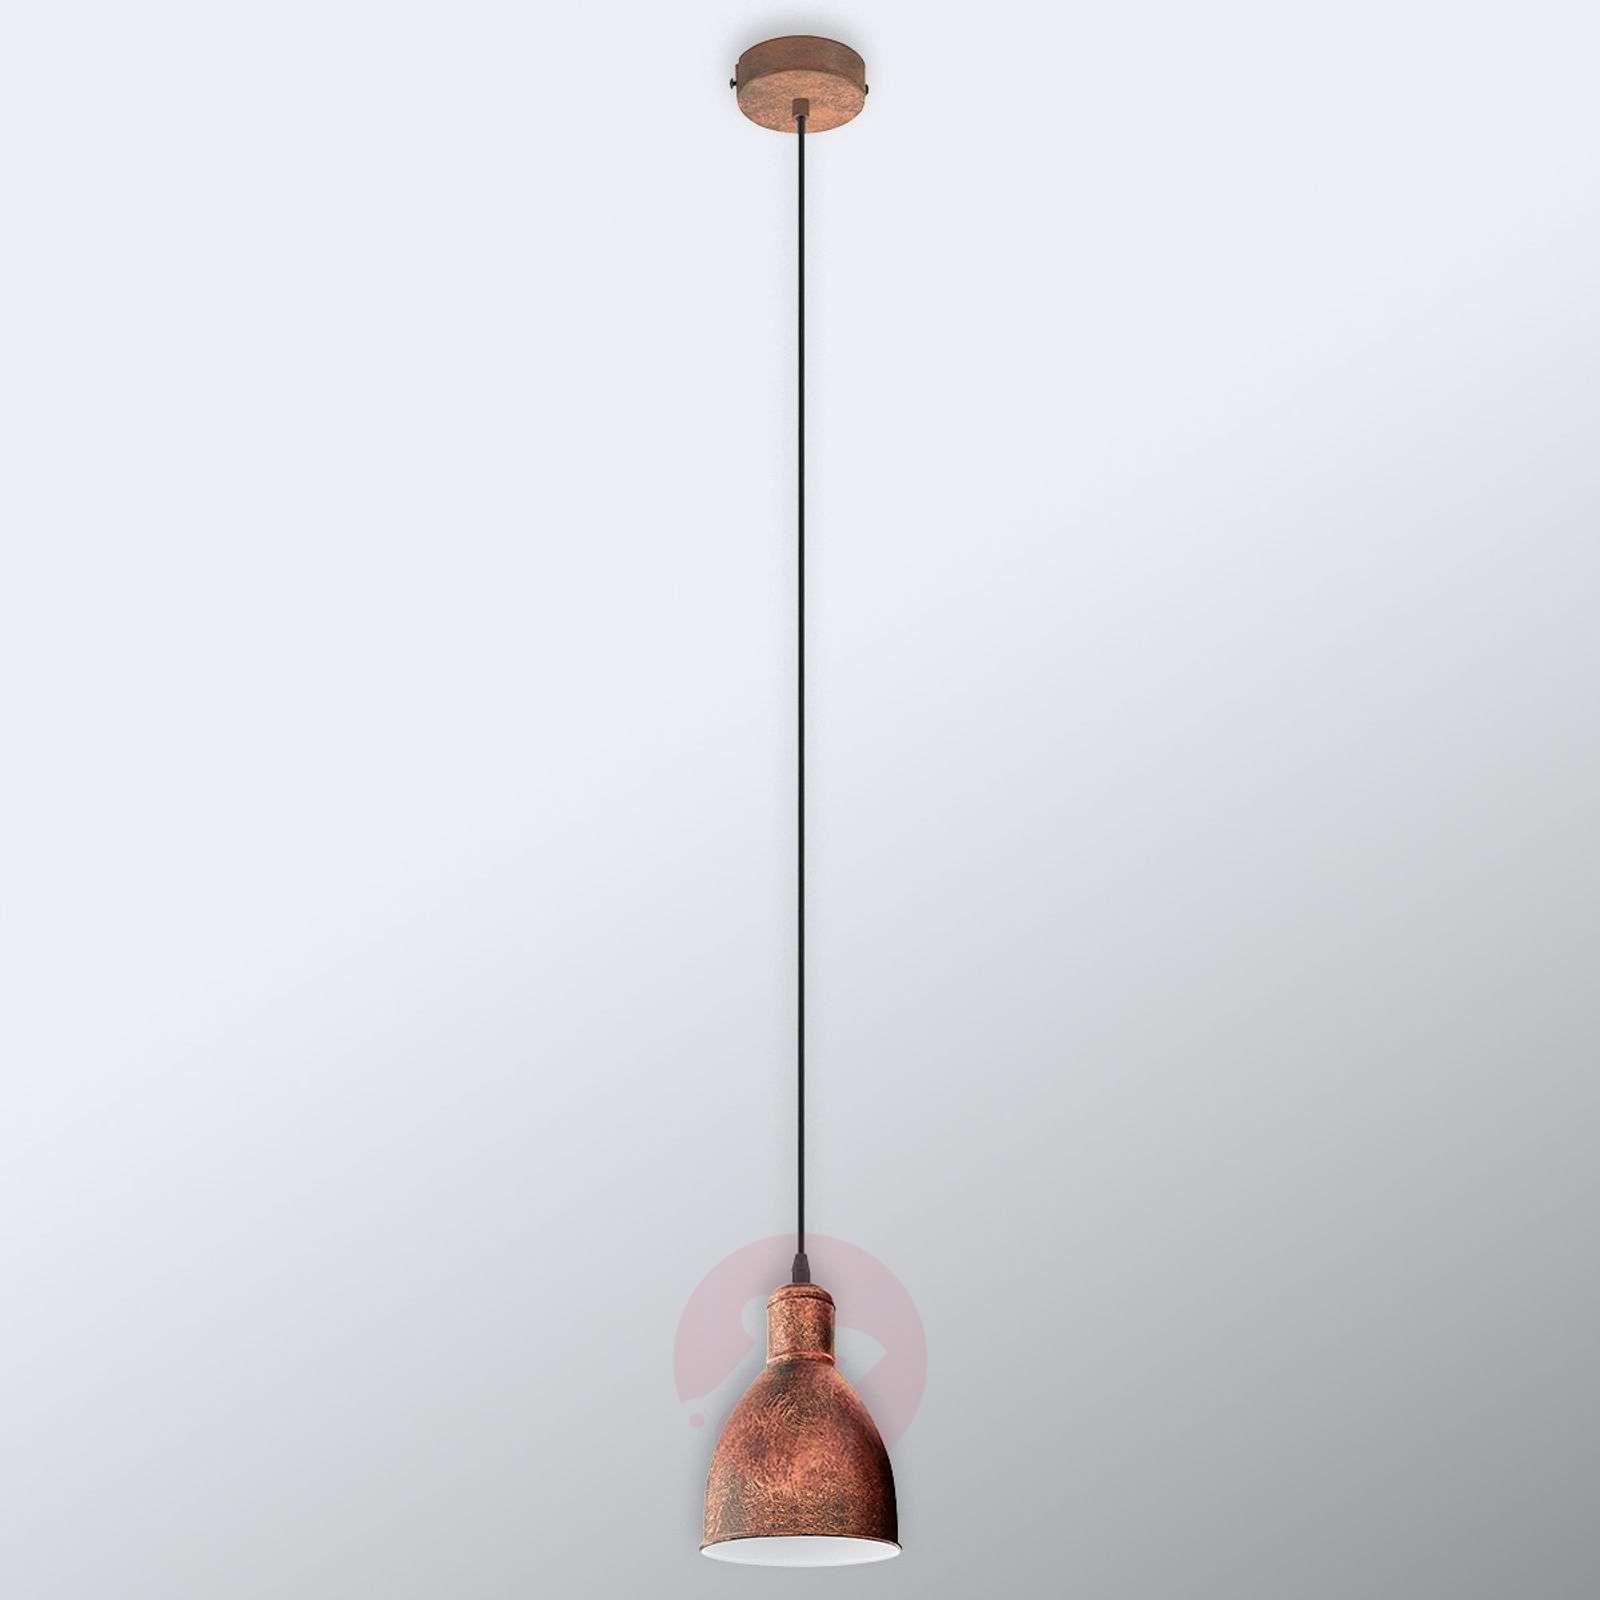 Priddy 1 vintage-riippuvalo 1-lampp antiikkikupari